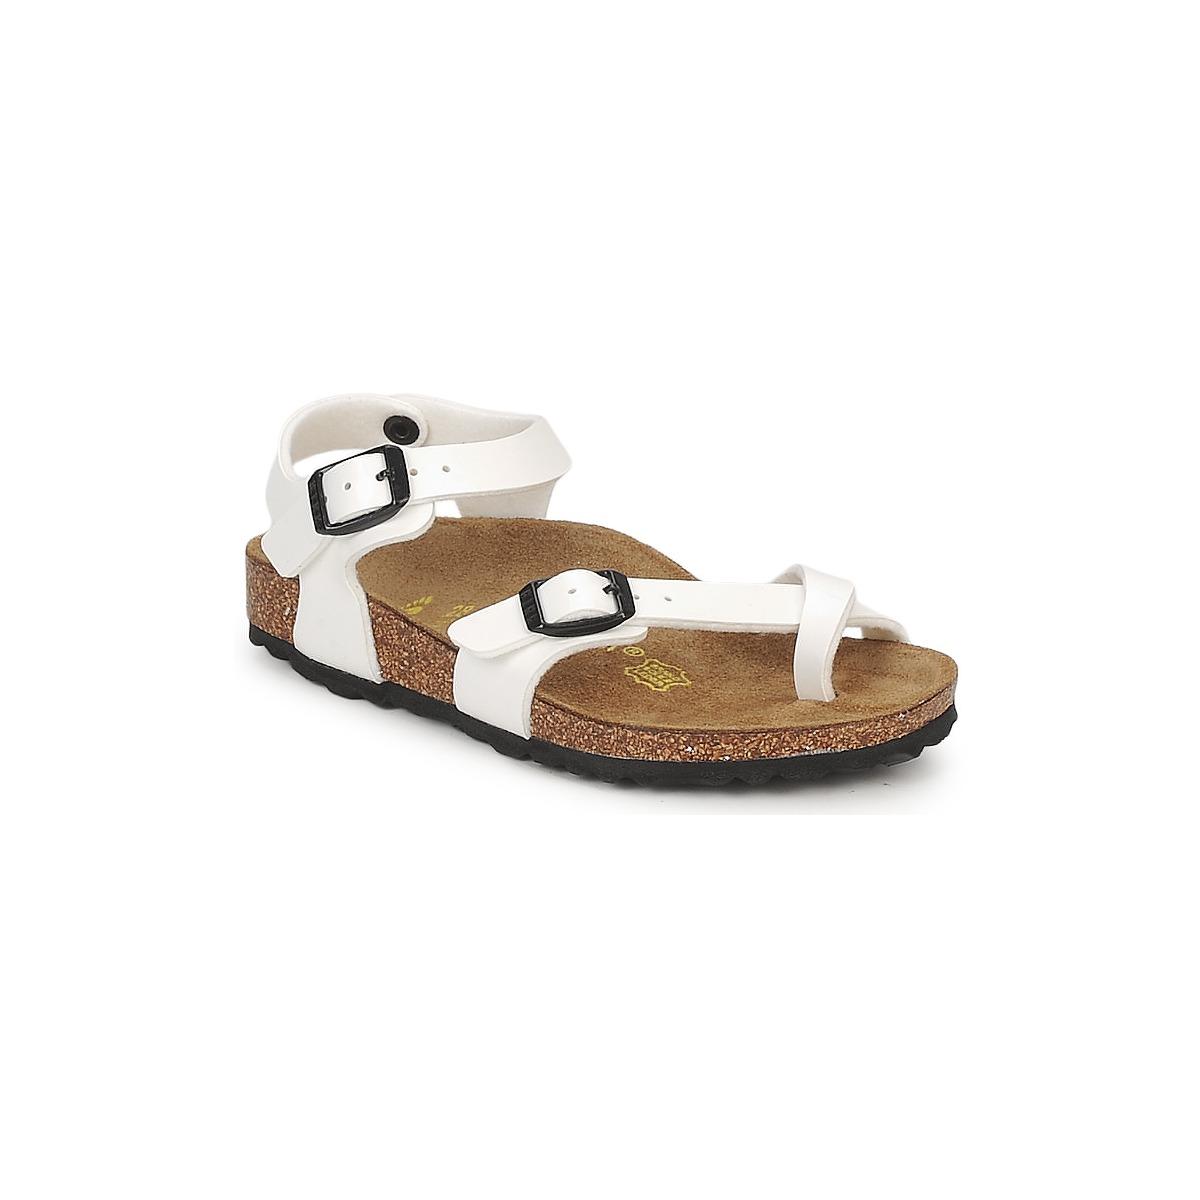 Sandale Birkenstock TAORMINA Blanc verni